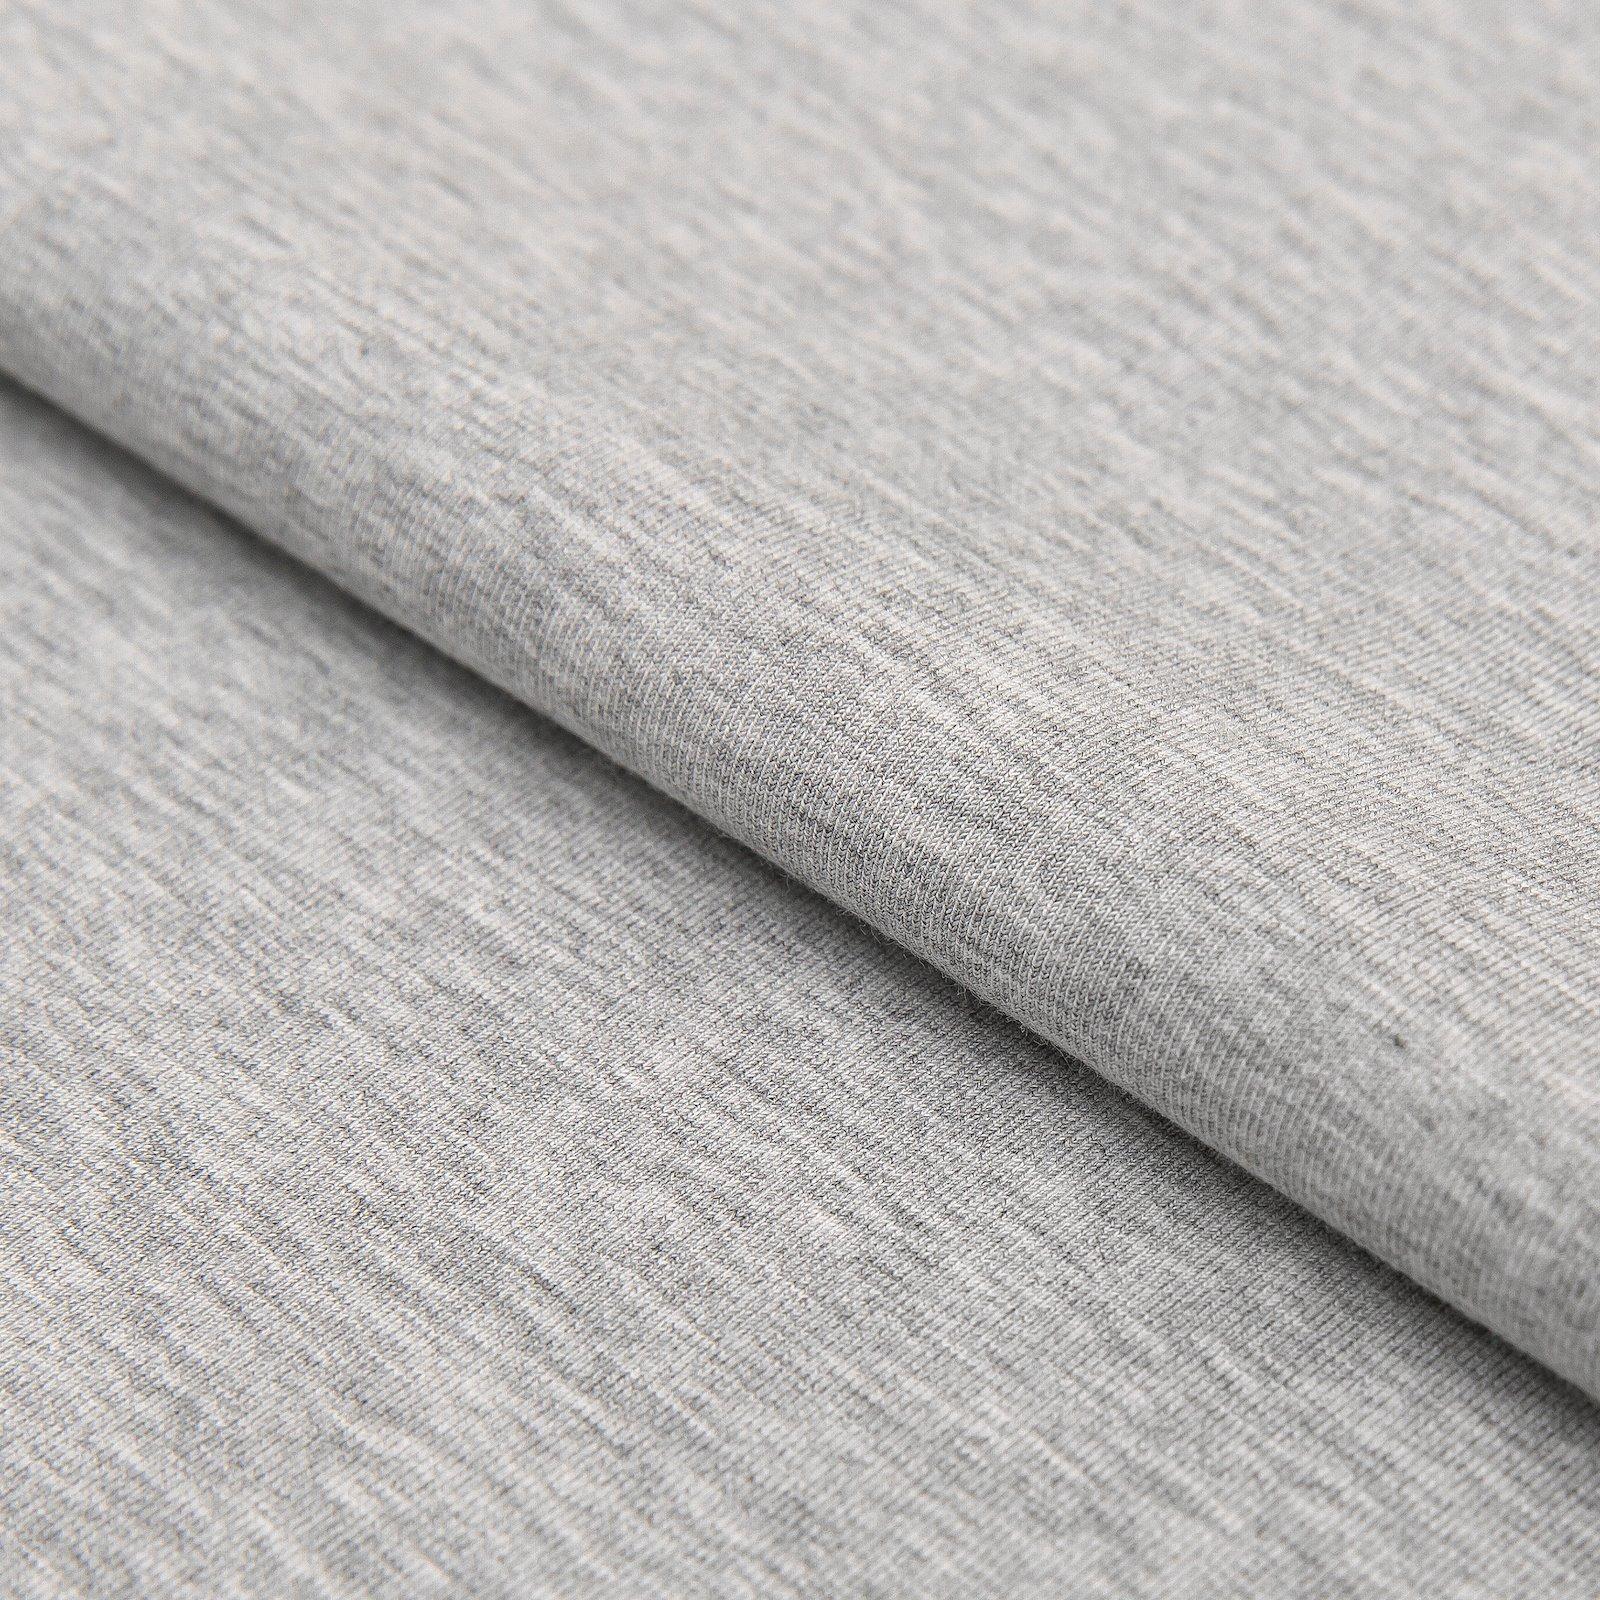 Organic stretch jersey light greymelange 271504_pack_d